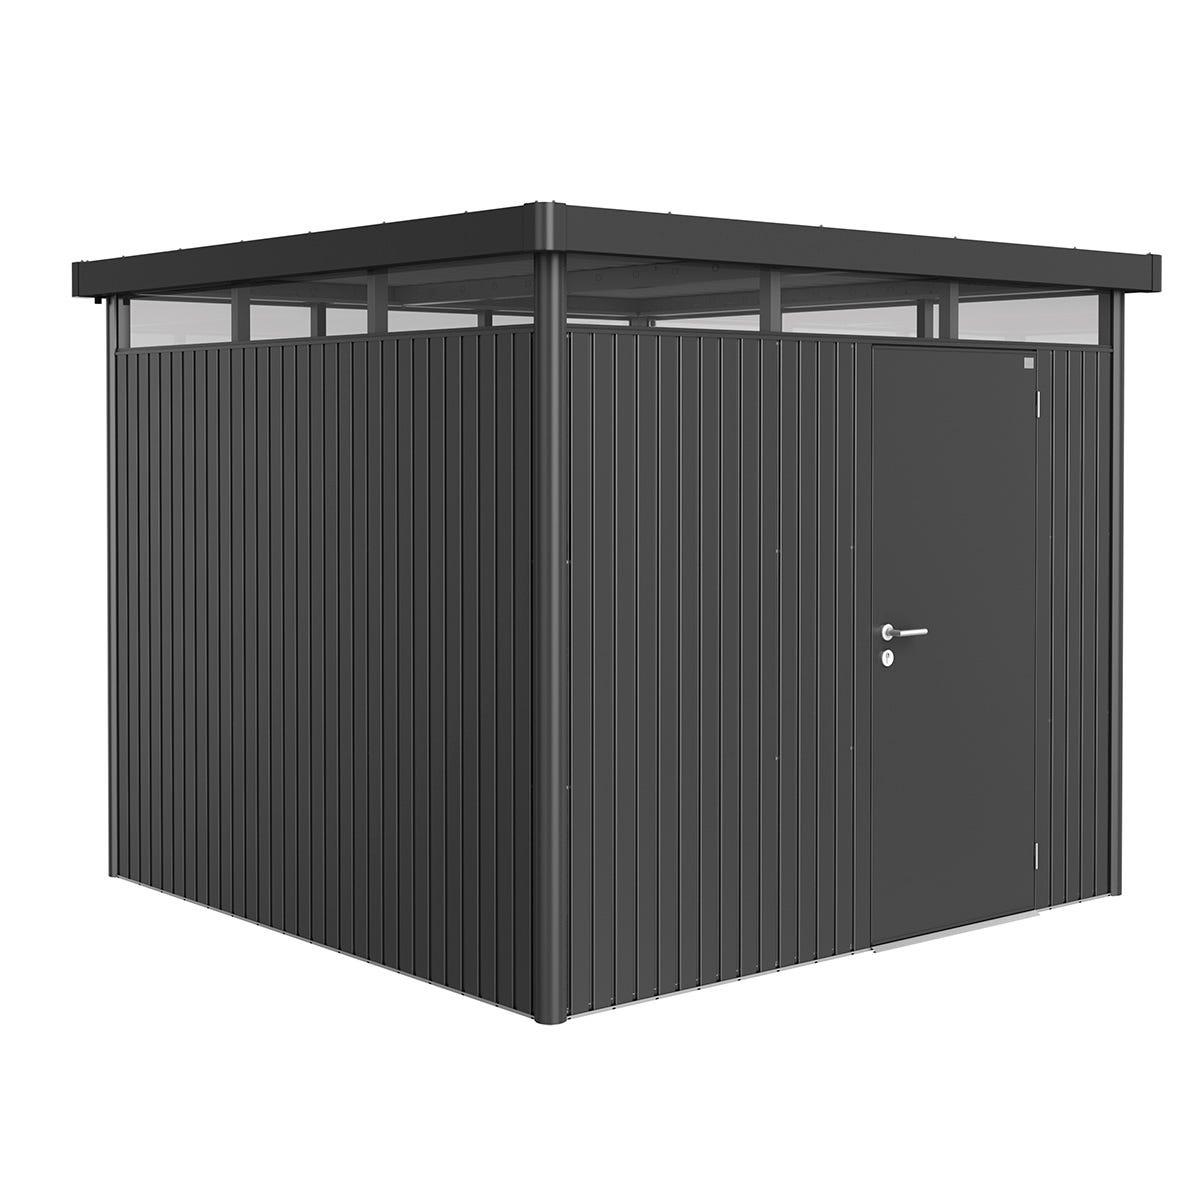 Biohort Highline Metal Shed H4 Standard door 9 x 9 - Dark Grey